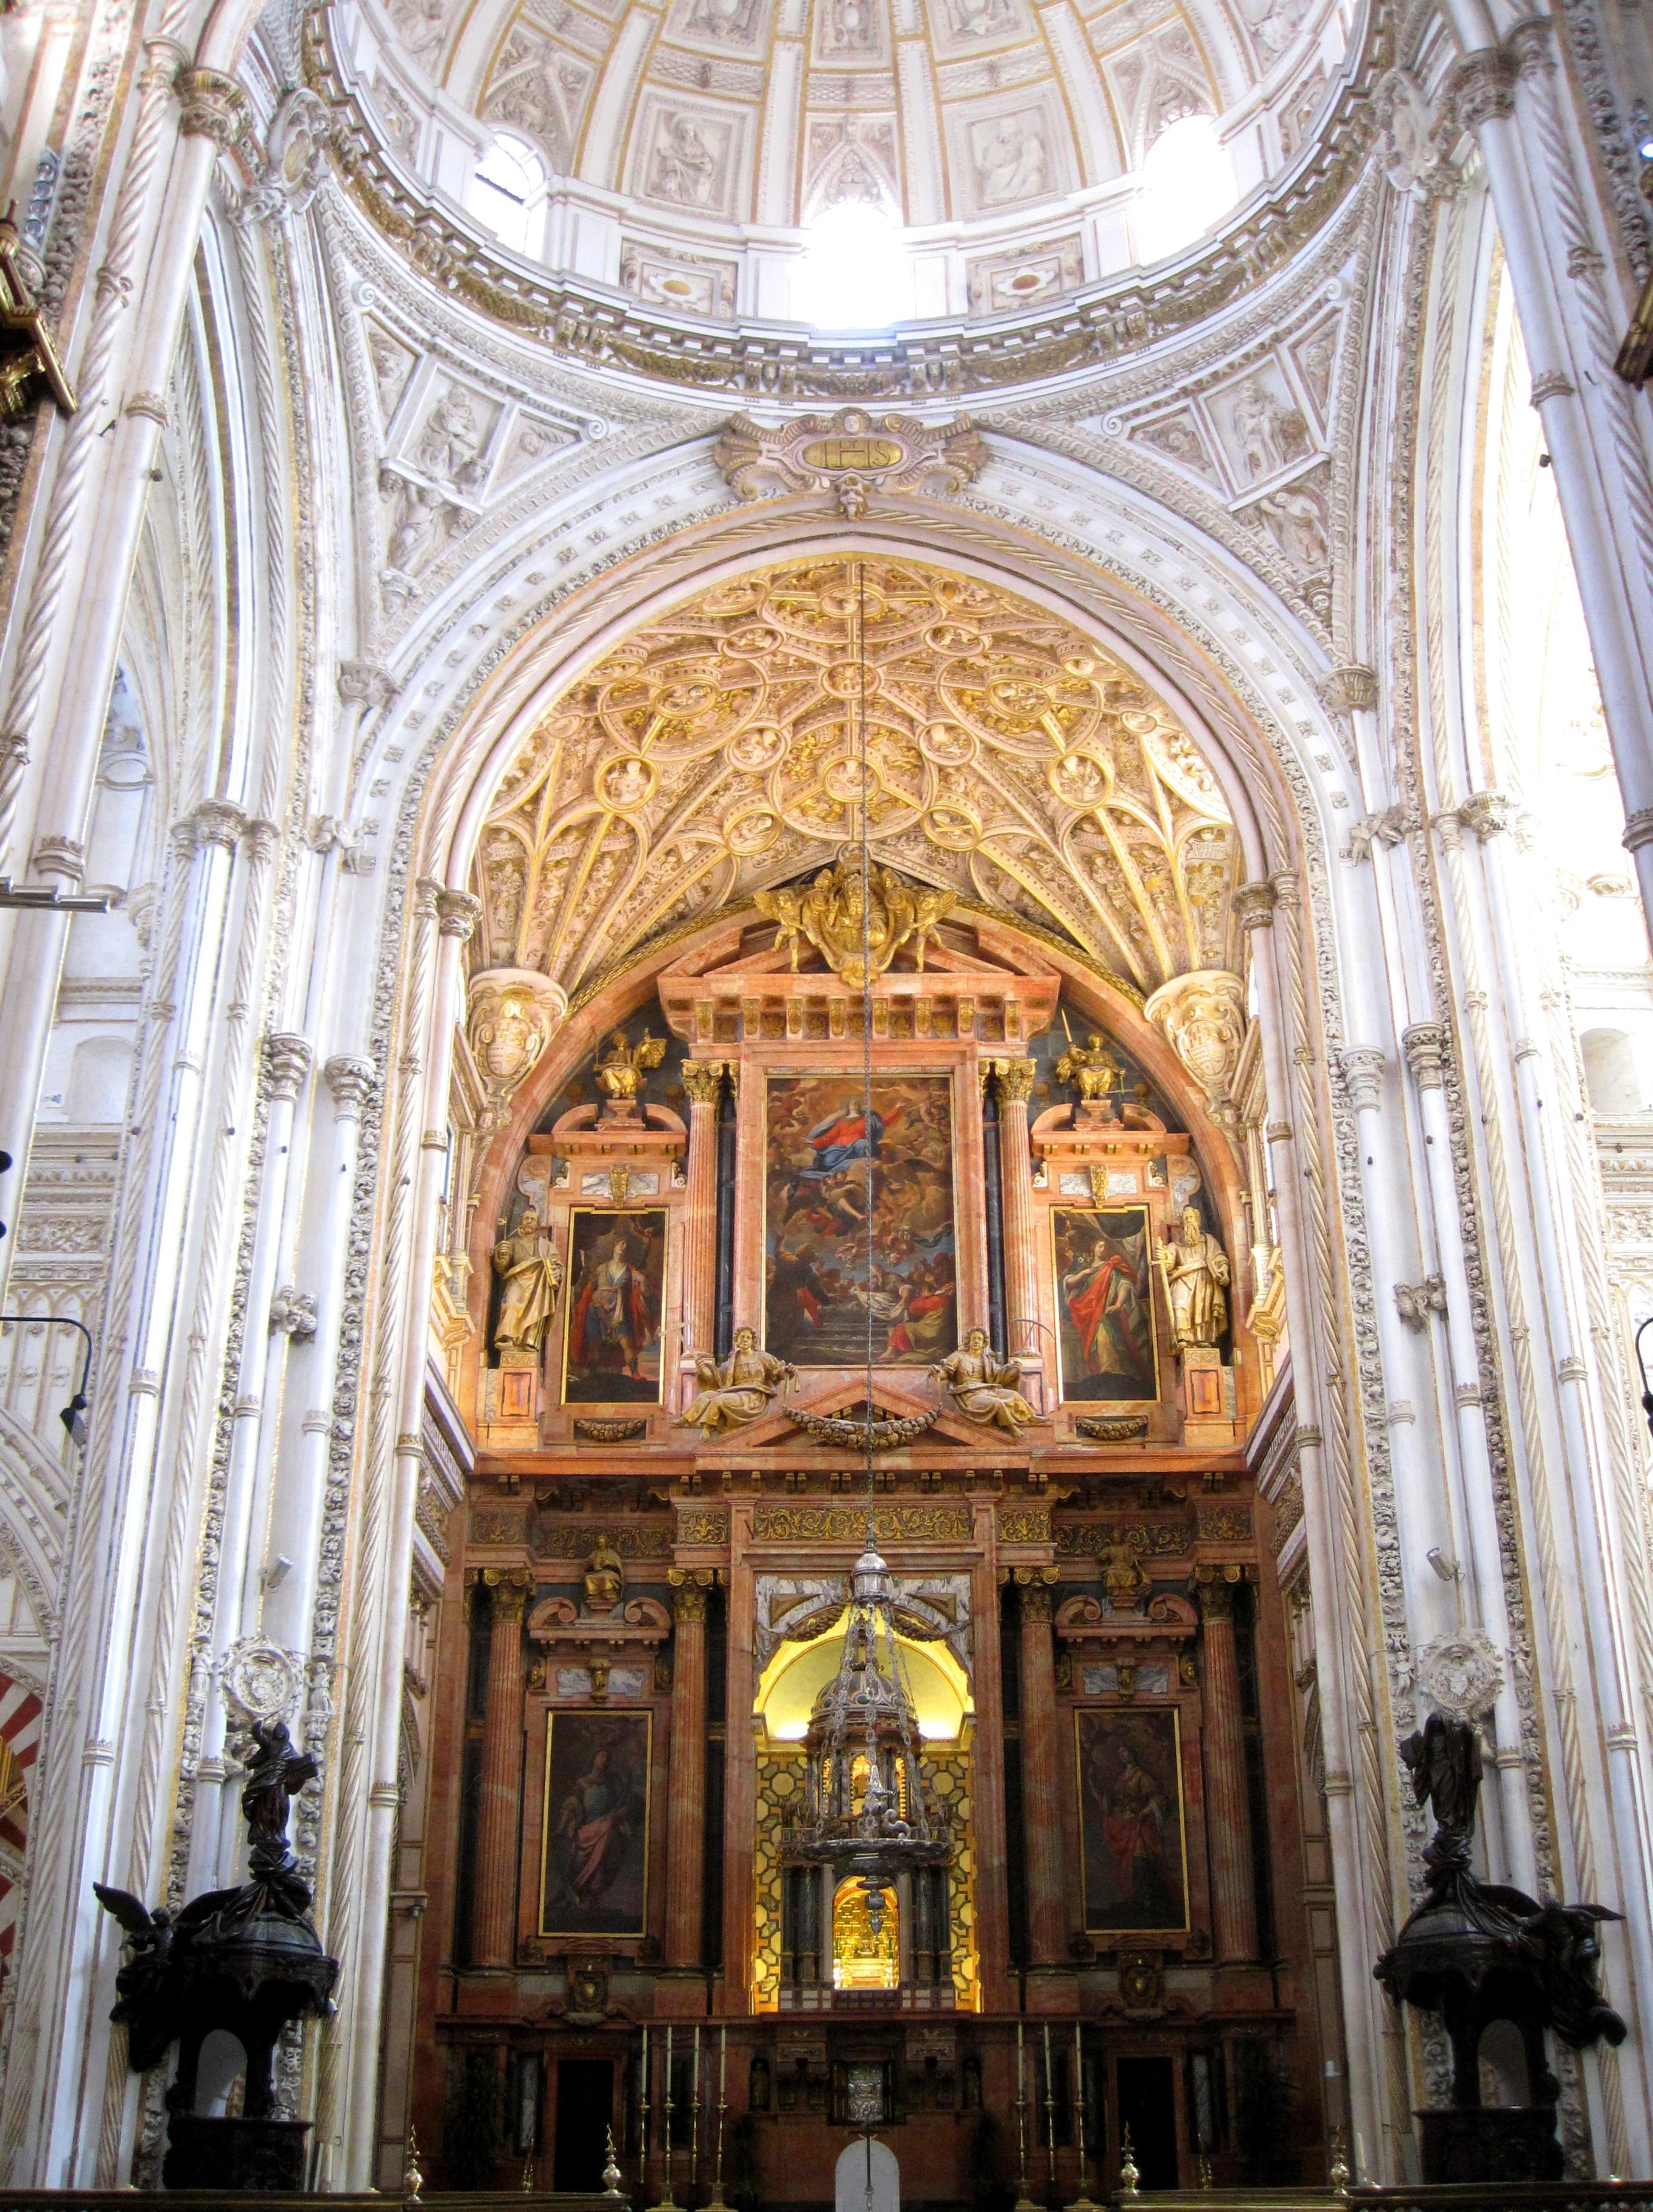 File:Altar de la Catedral. Mezquita-Catedral de Córdoba, Córdoba..JPG - Wikim...